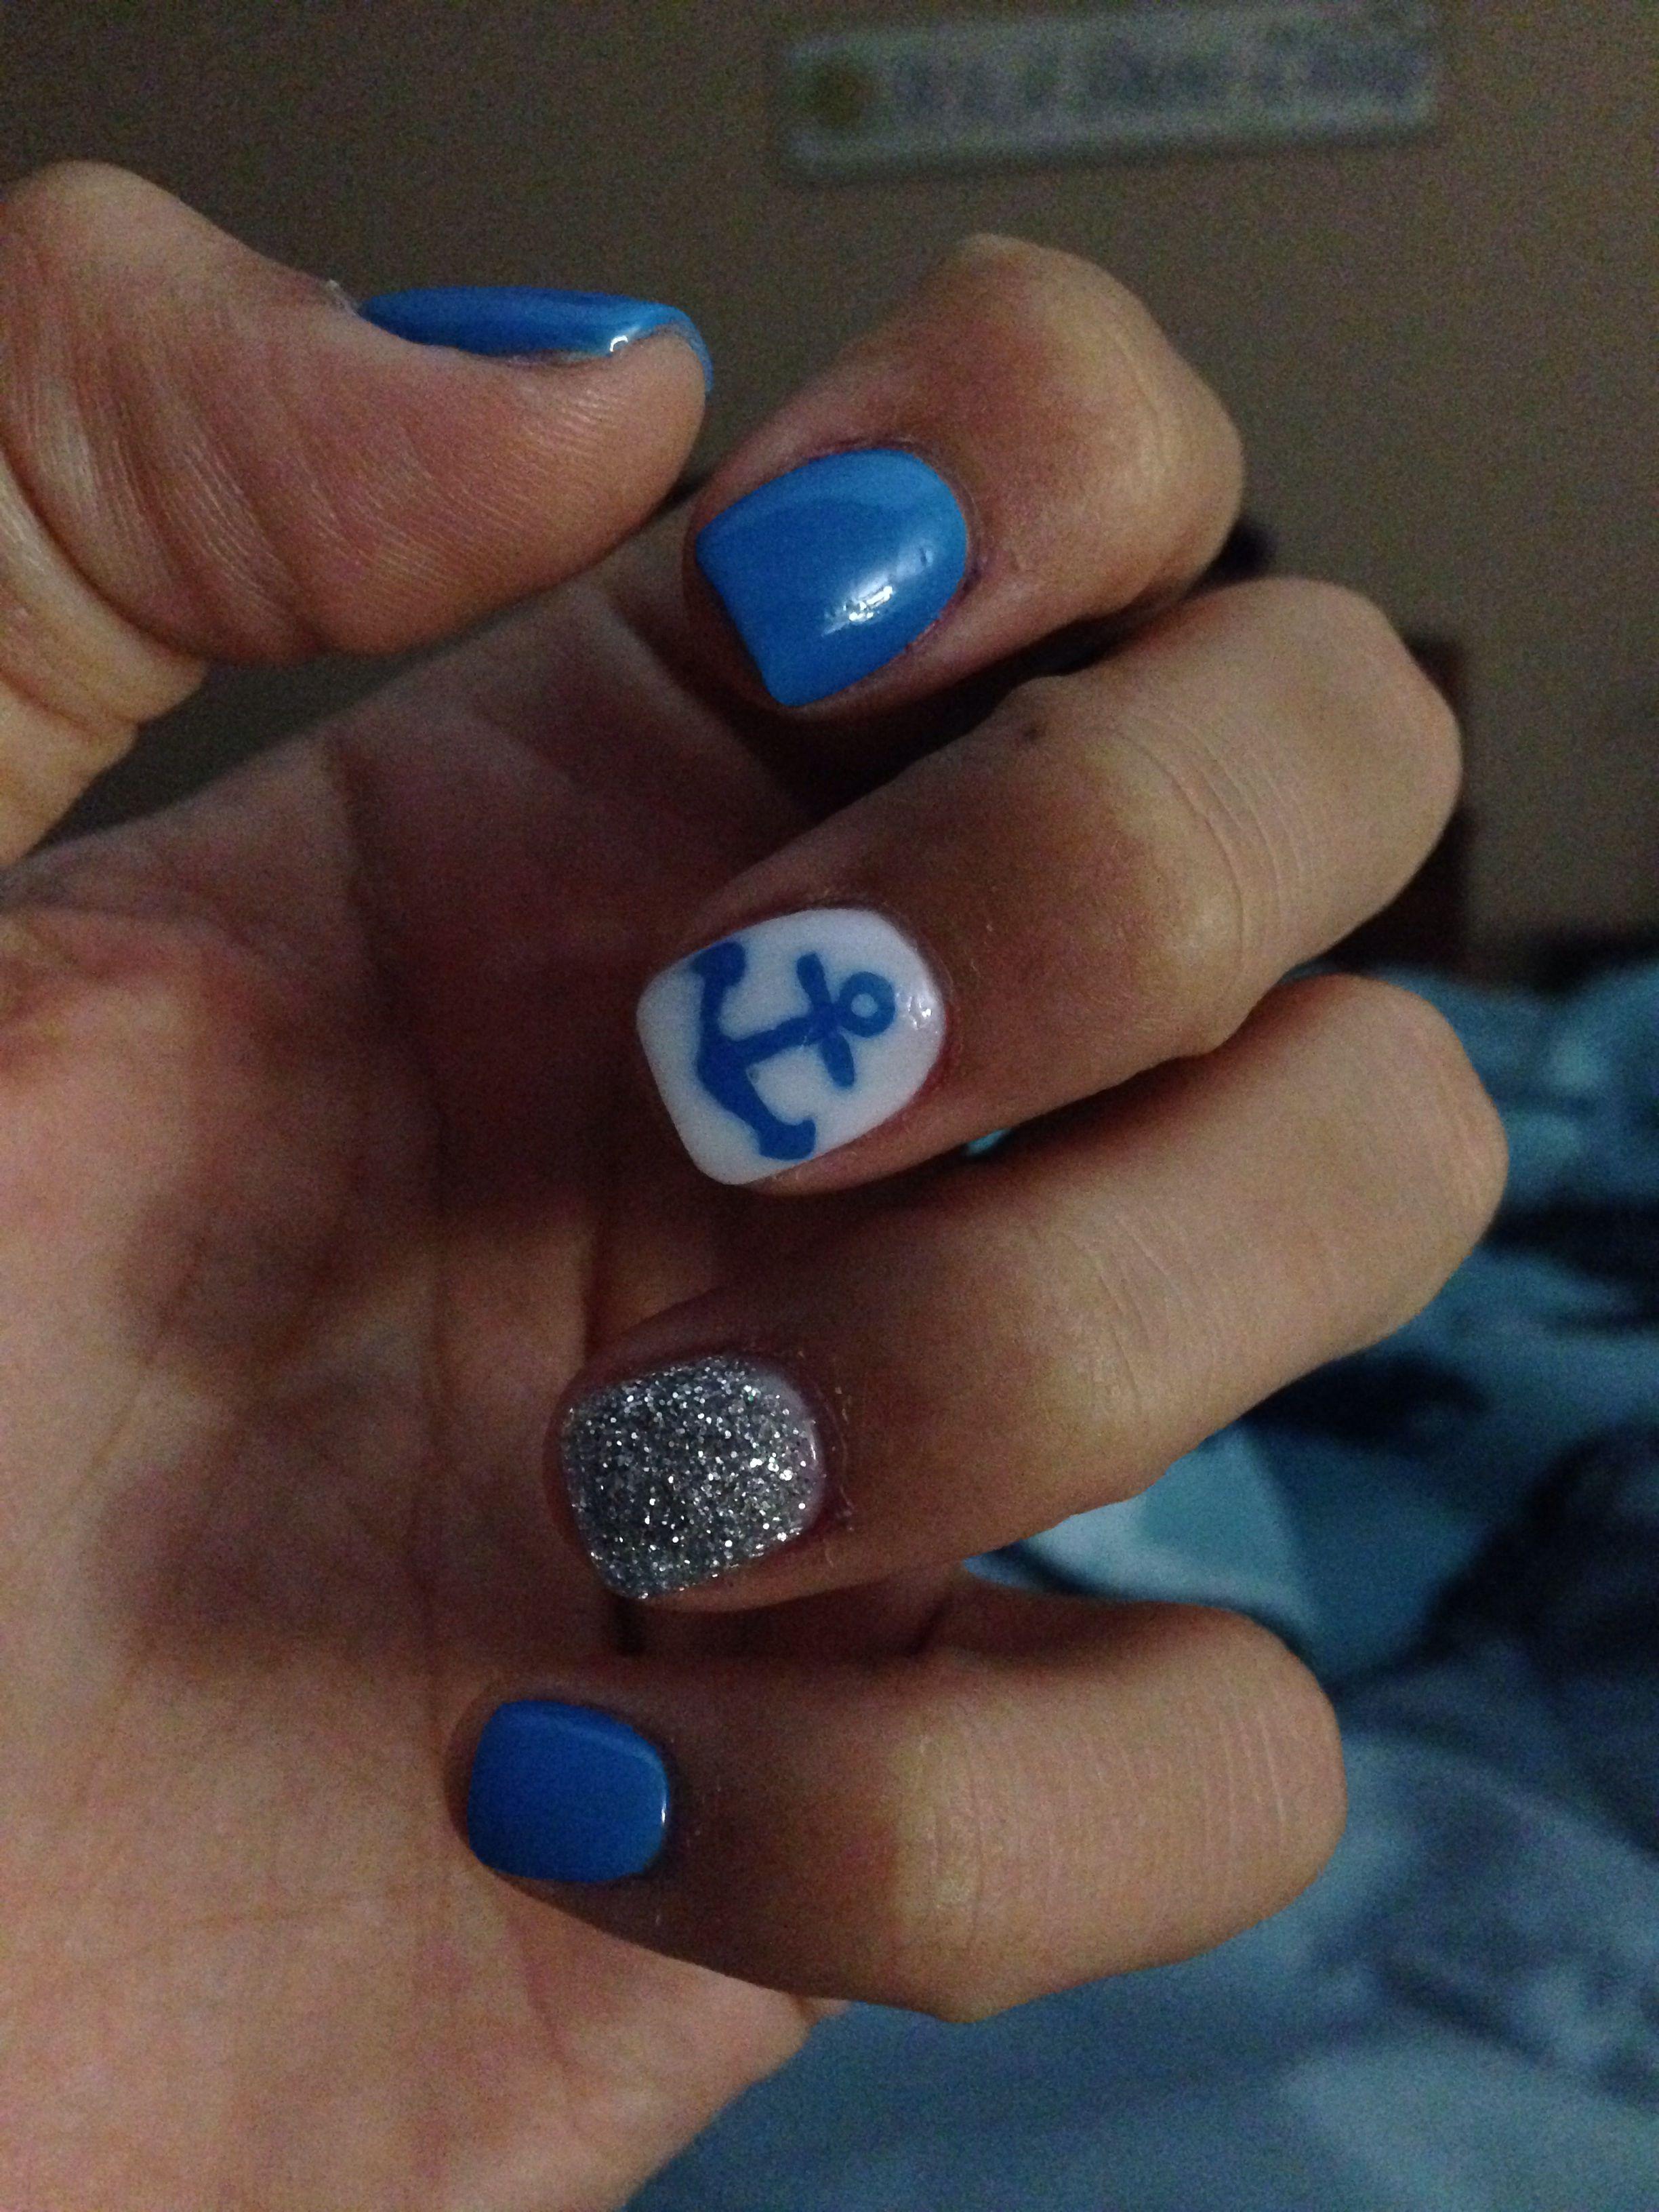 Powdered Gel Nails Design Vj Nails In Calgary Alberta: Nautical Nails ; Gel Powder